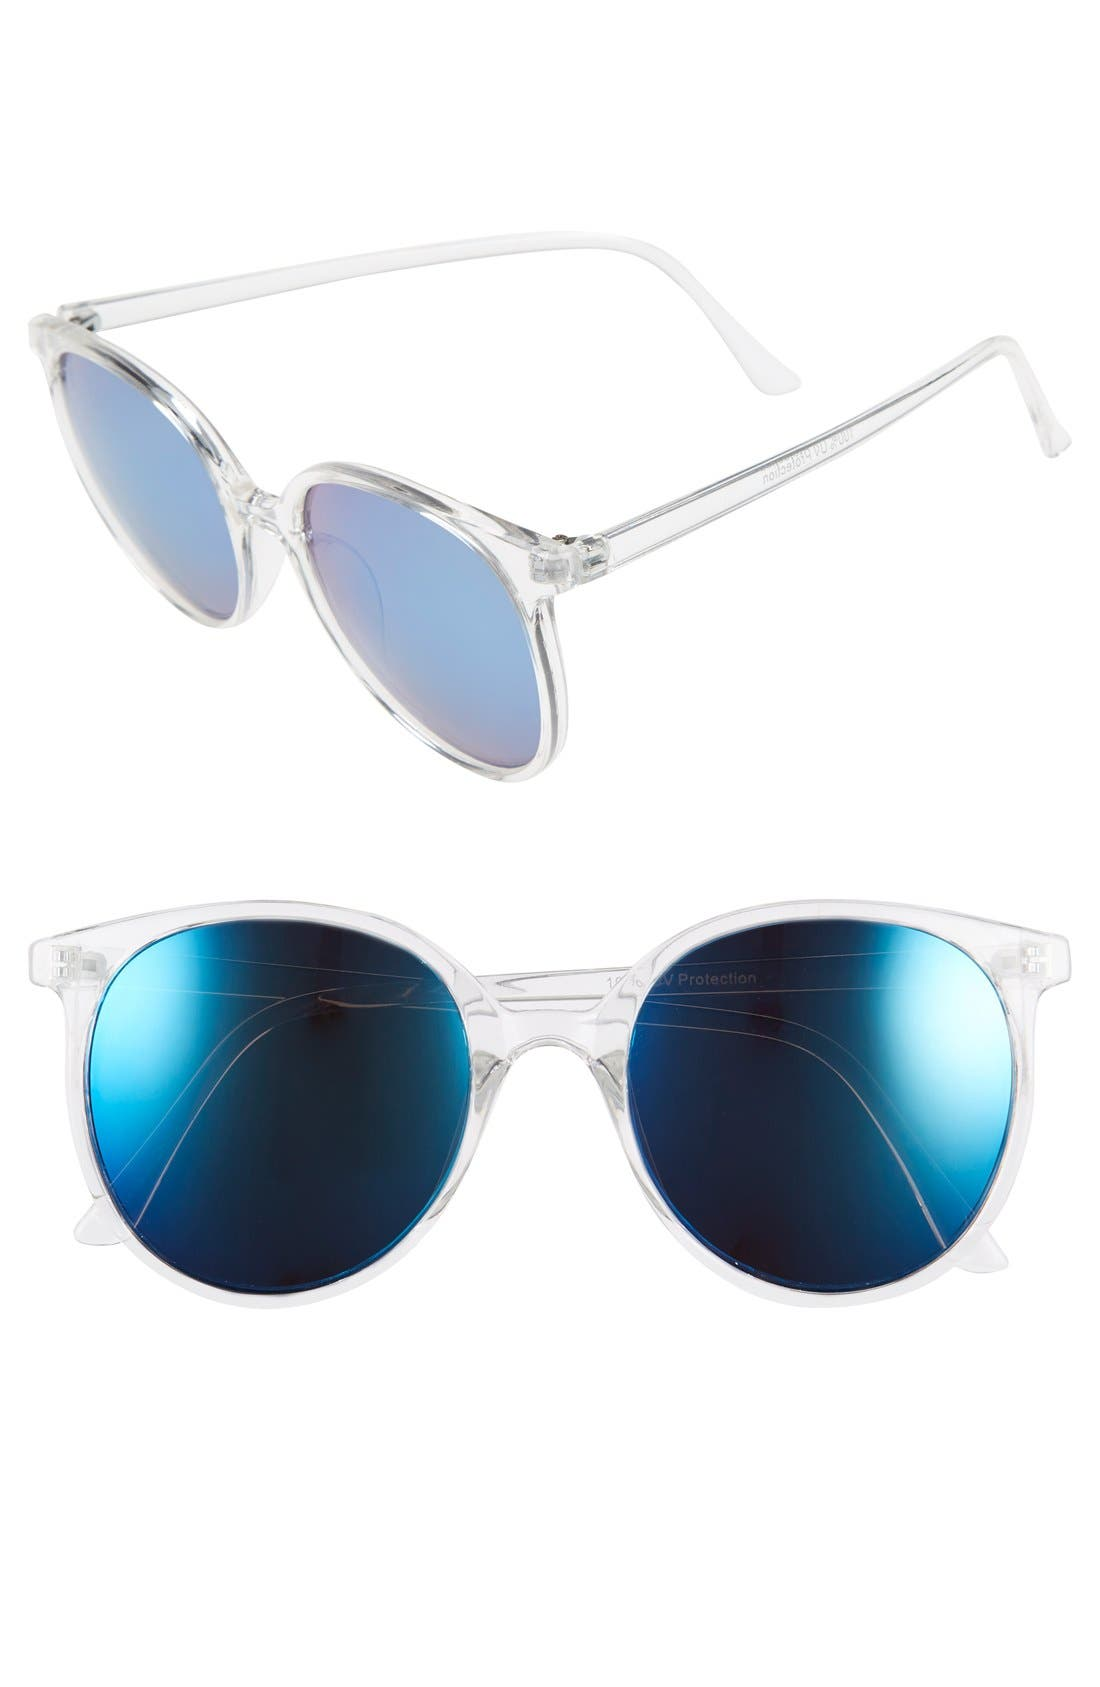 Alternate Image 1 Selected - BP. Mirrored Round Sunglasses